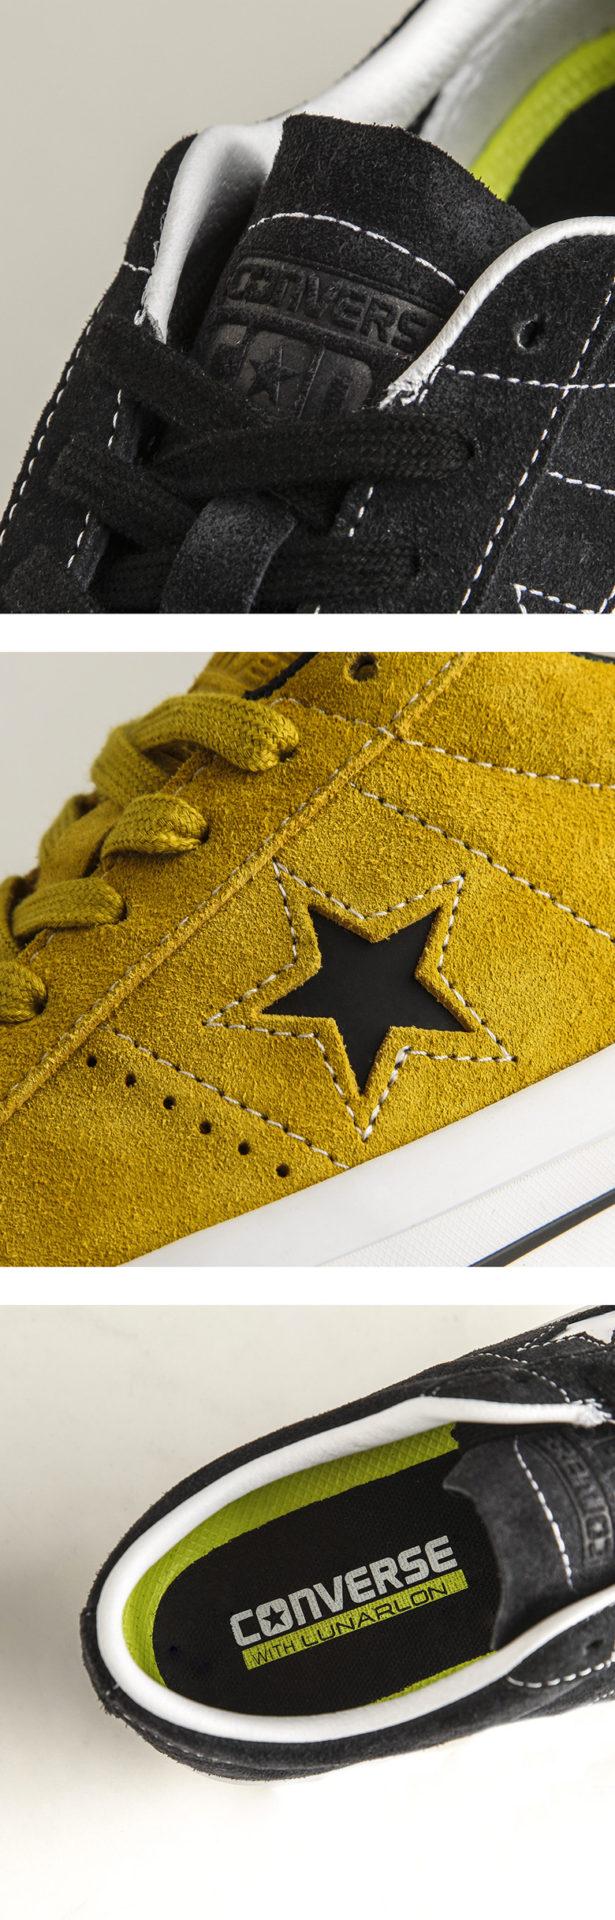 converse-one-star-pro-2015-2